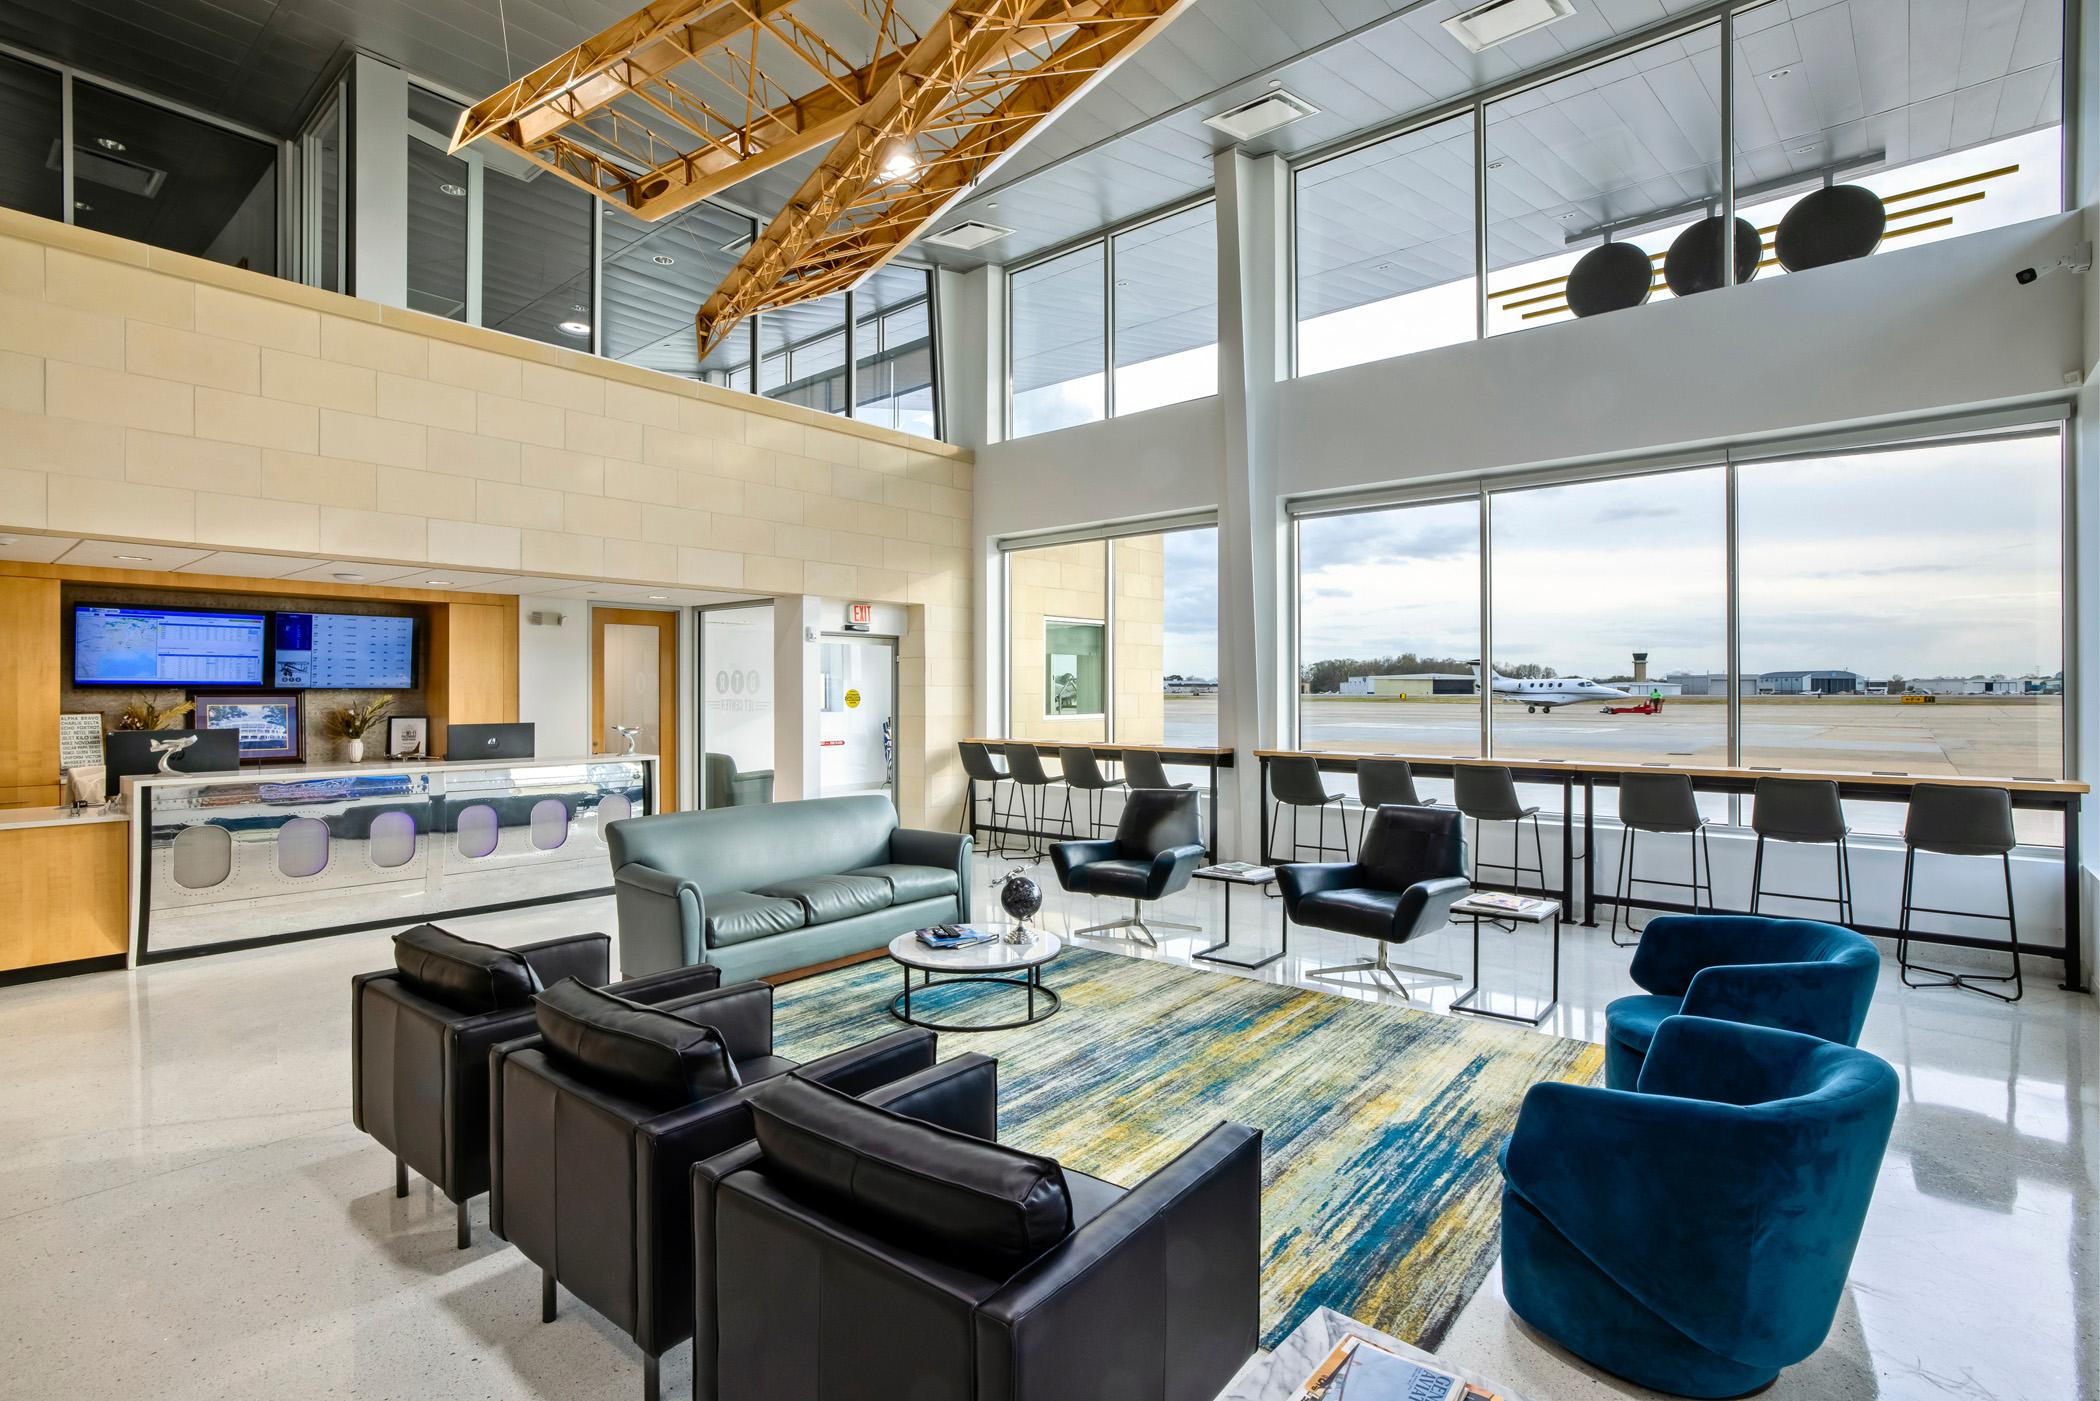 BTR Jet Center - Customer Lounge